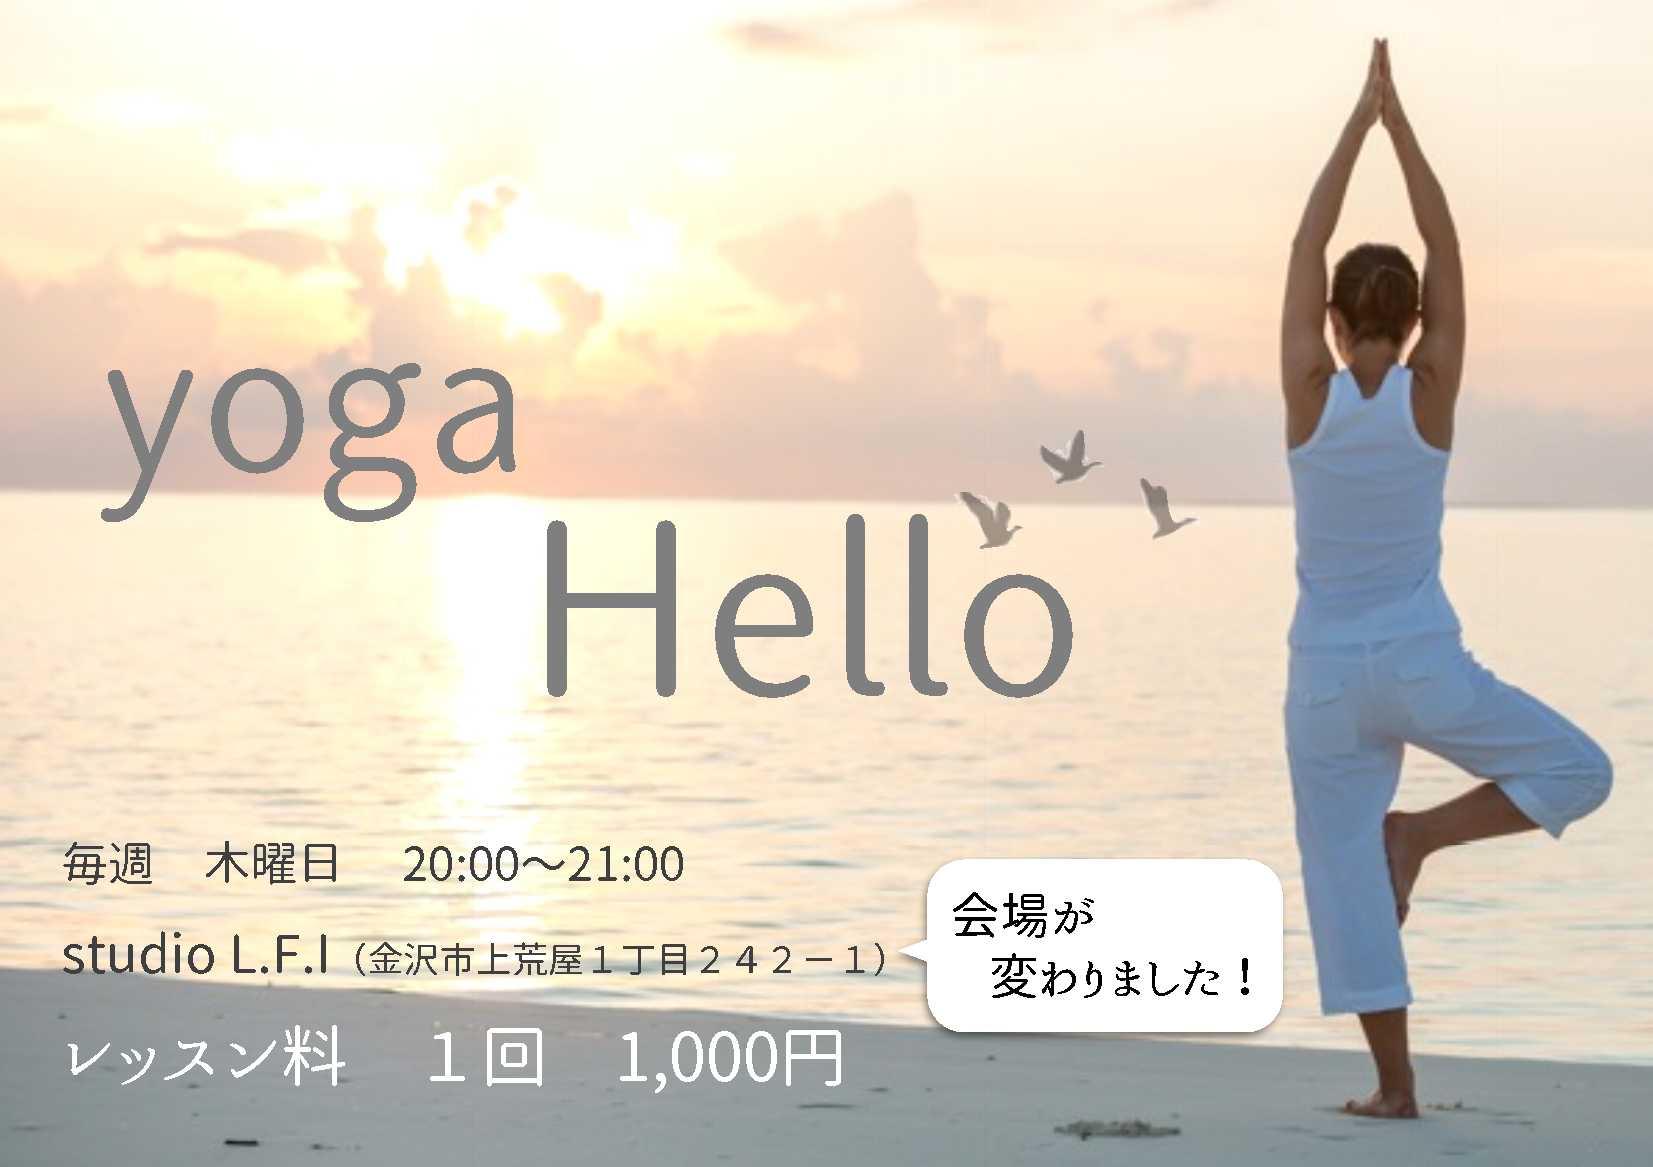 ①yoga hello